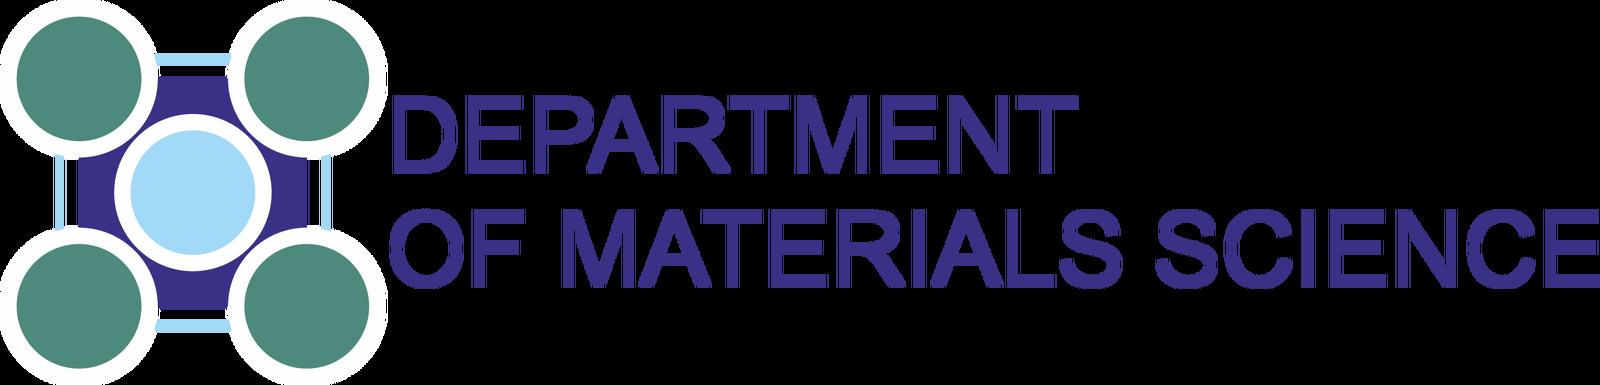 logo_2016_en-1.png